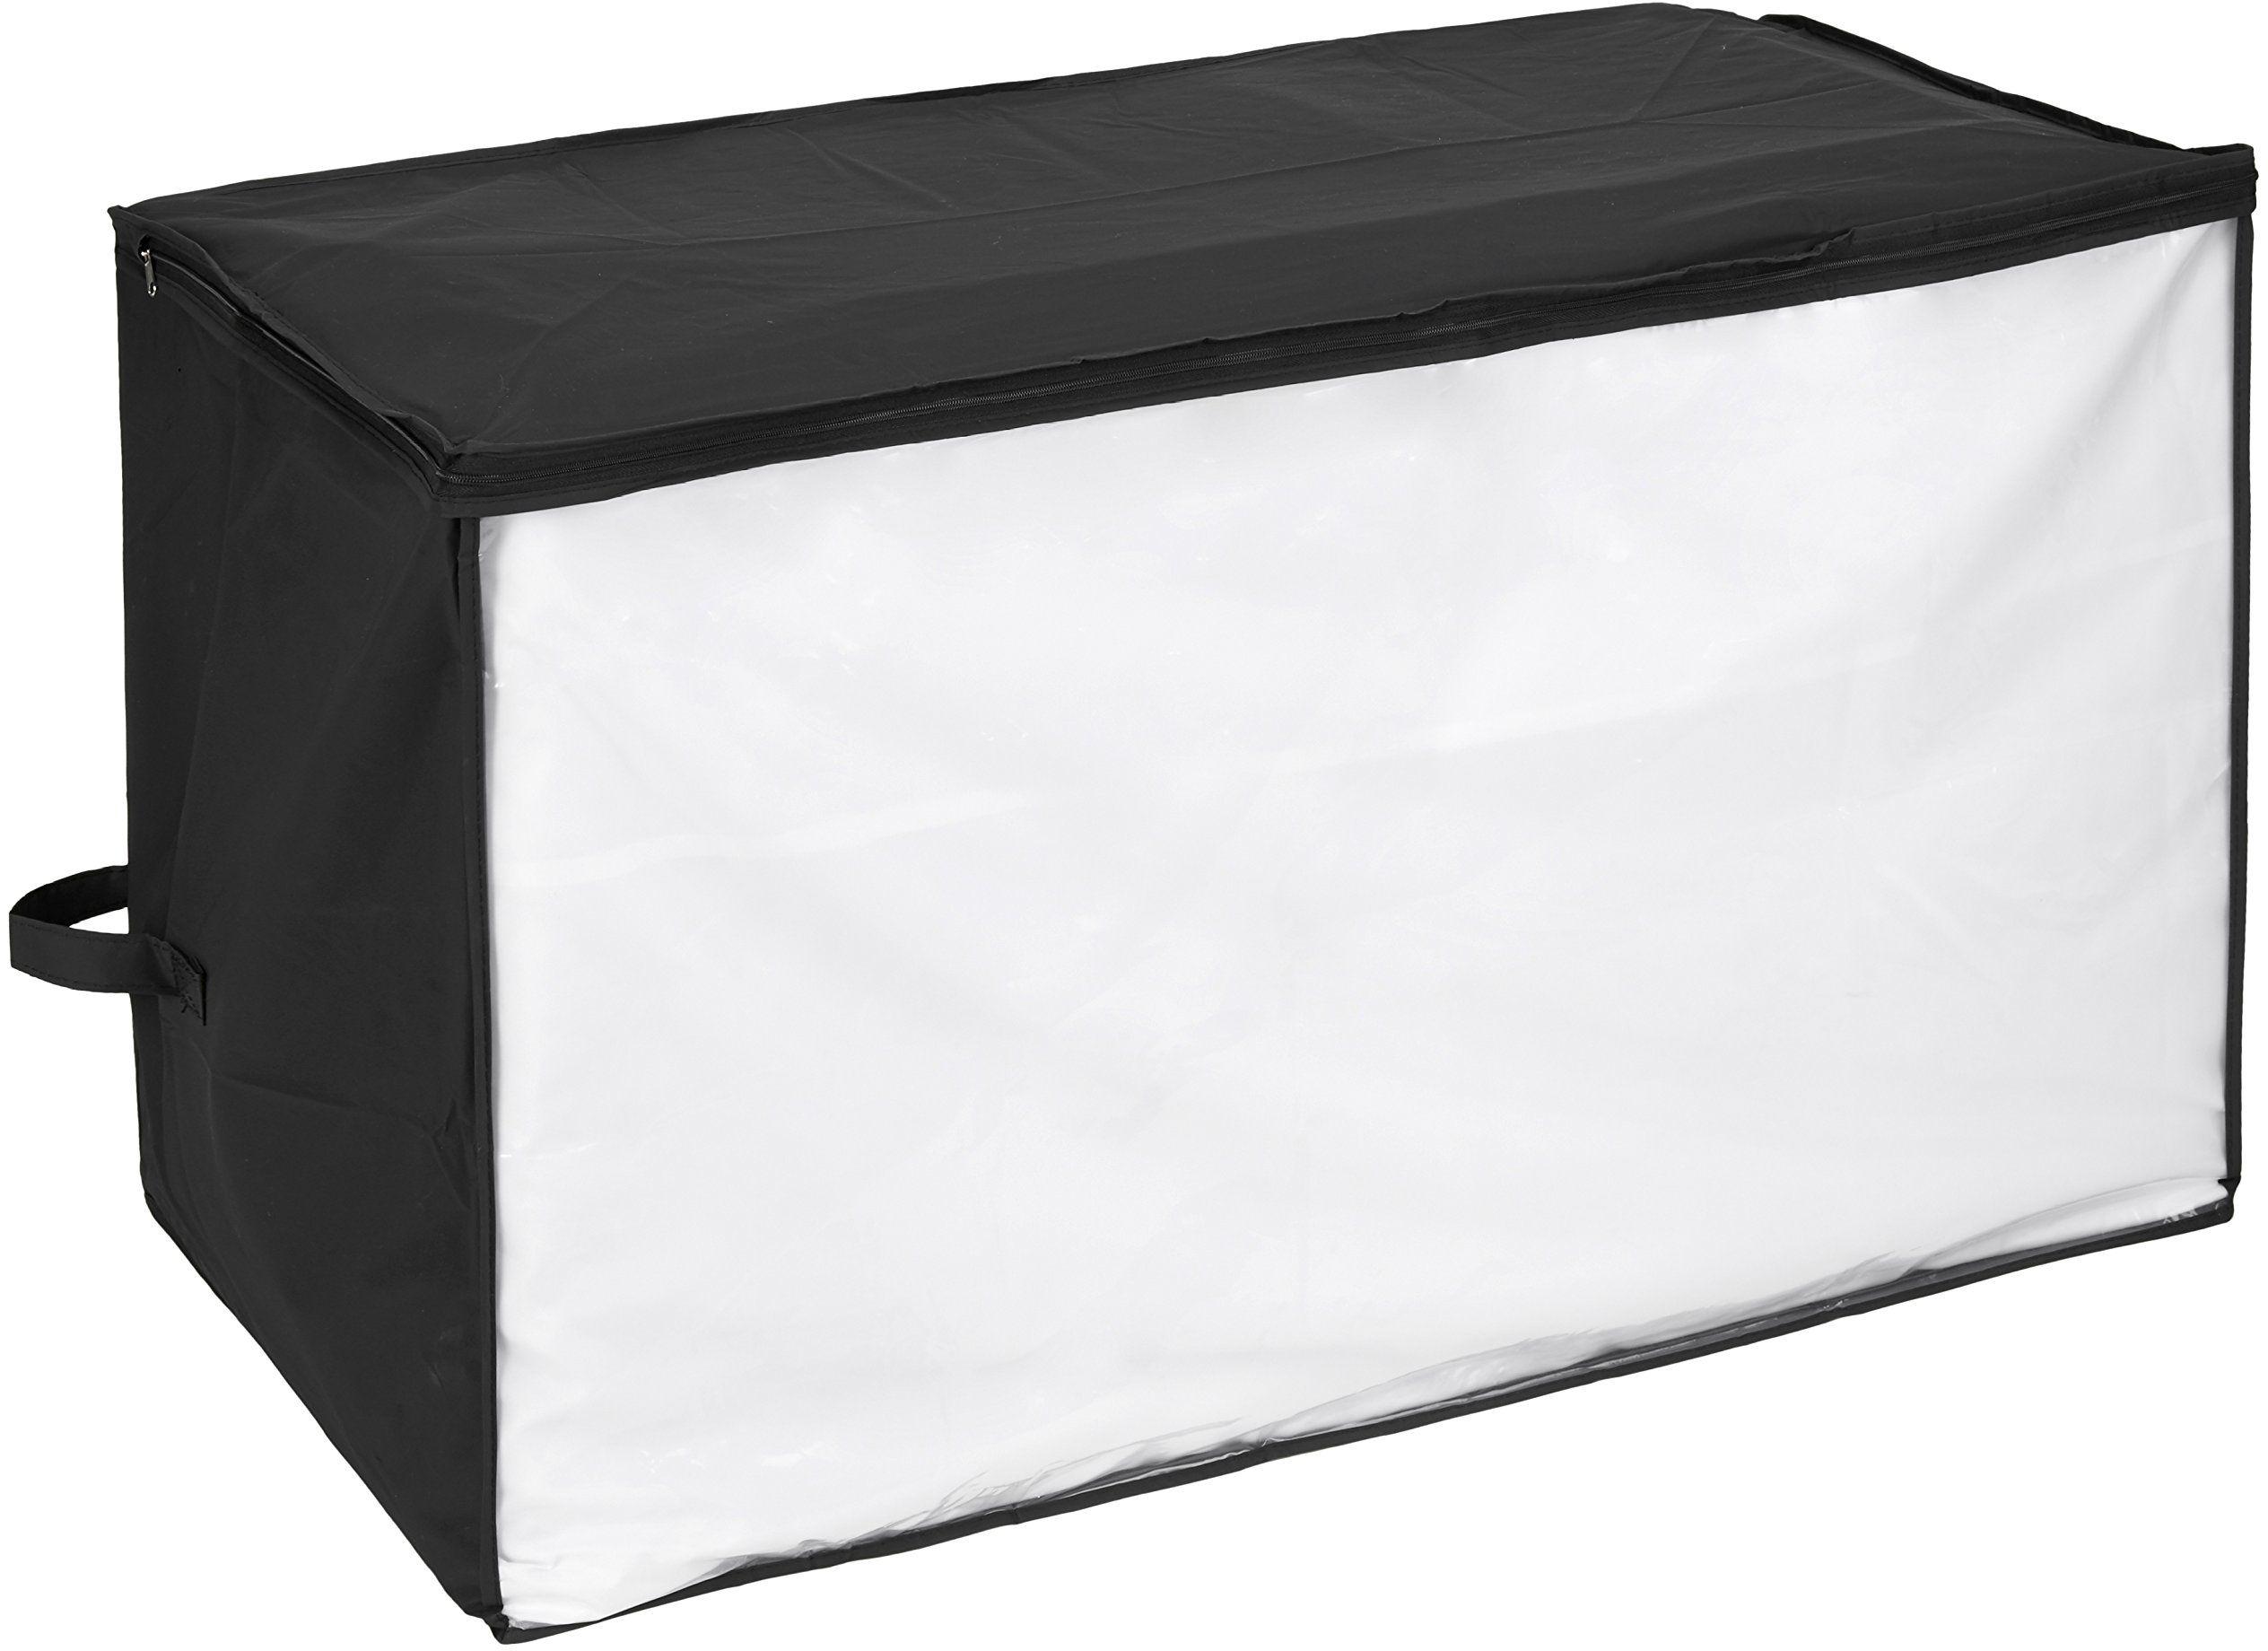 WENKO Jumbo Box Deep Black, octan winylu, 91 x 48 x 53 cm, czarny